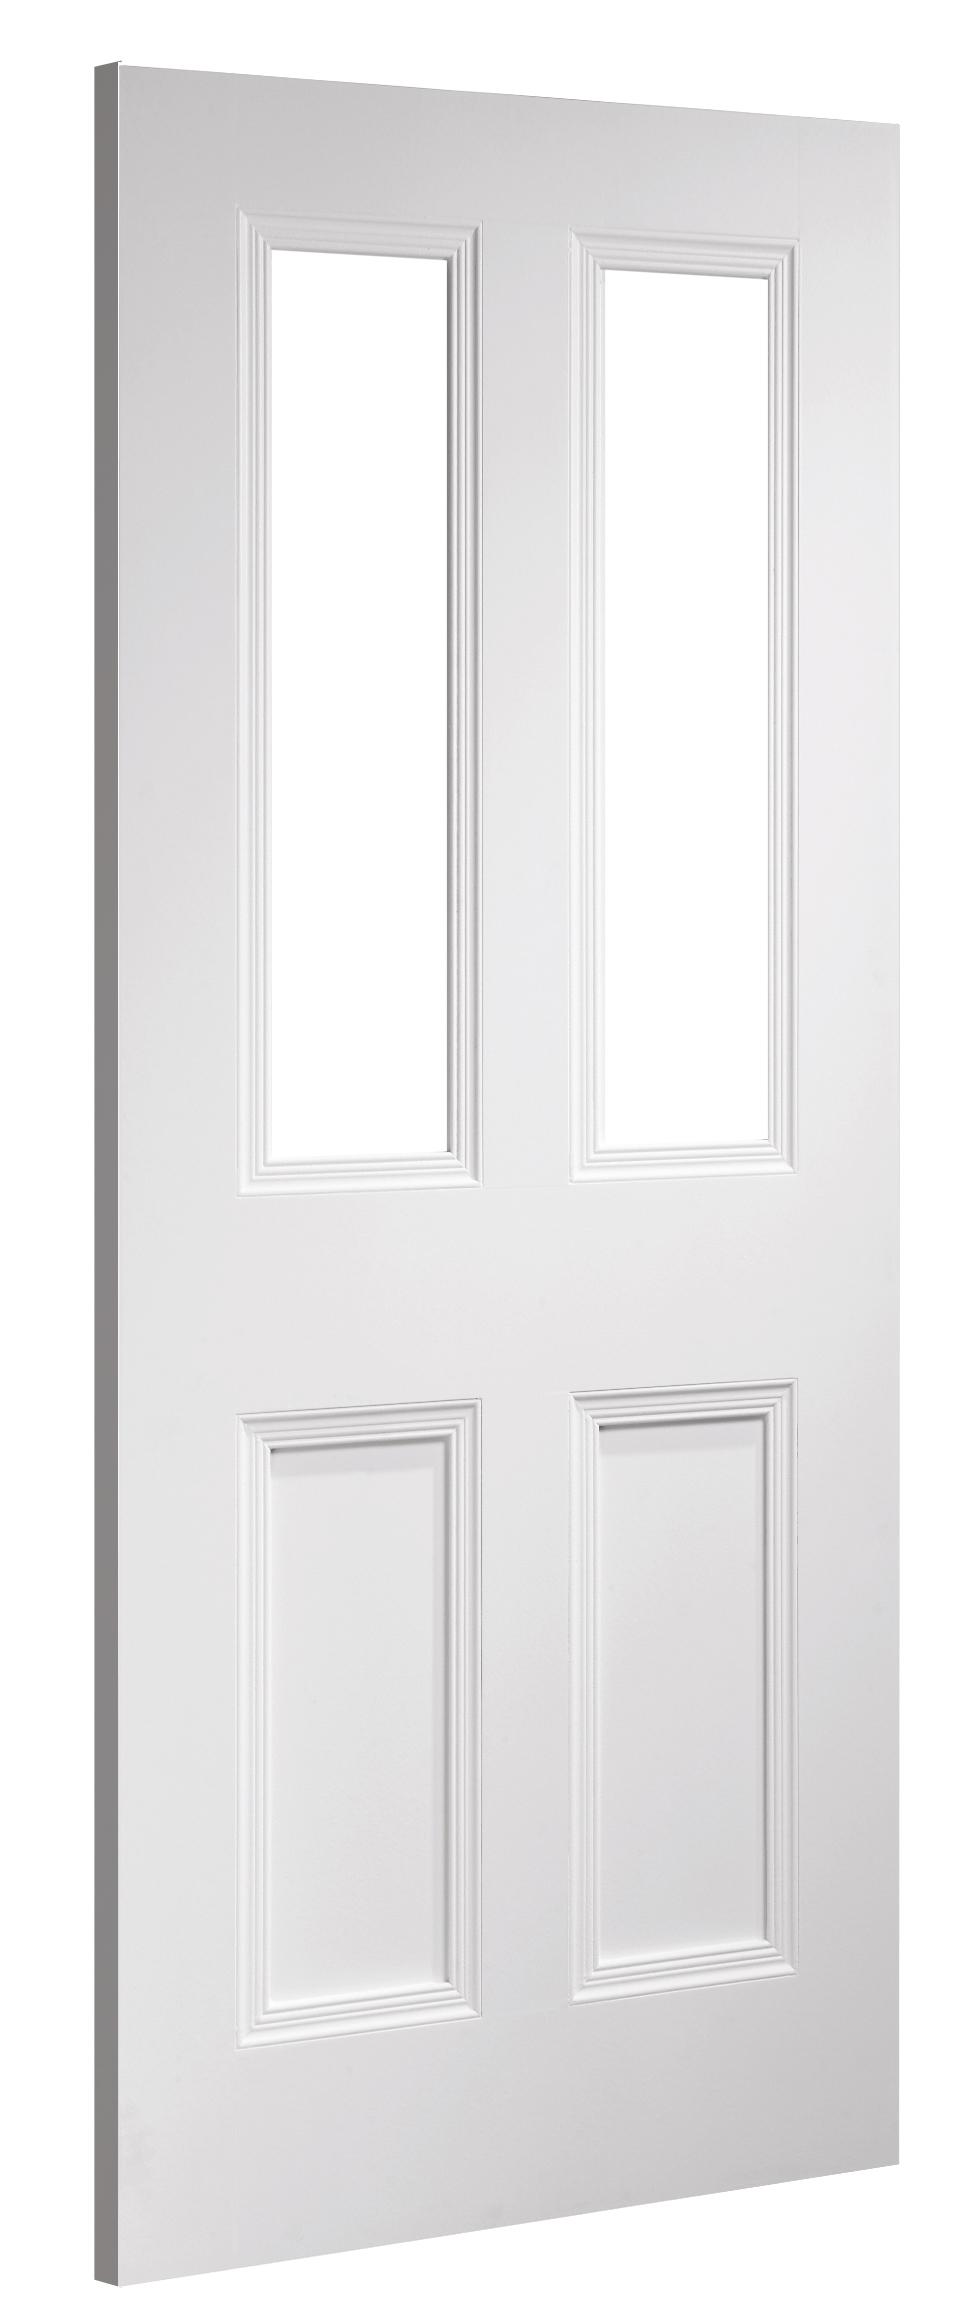 Primed Doors NM1G-C